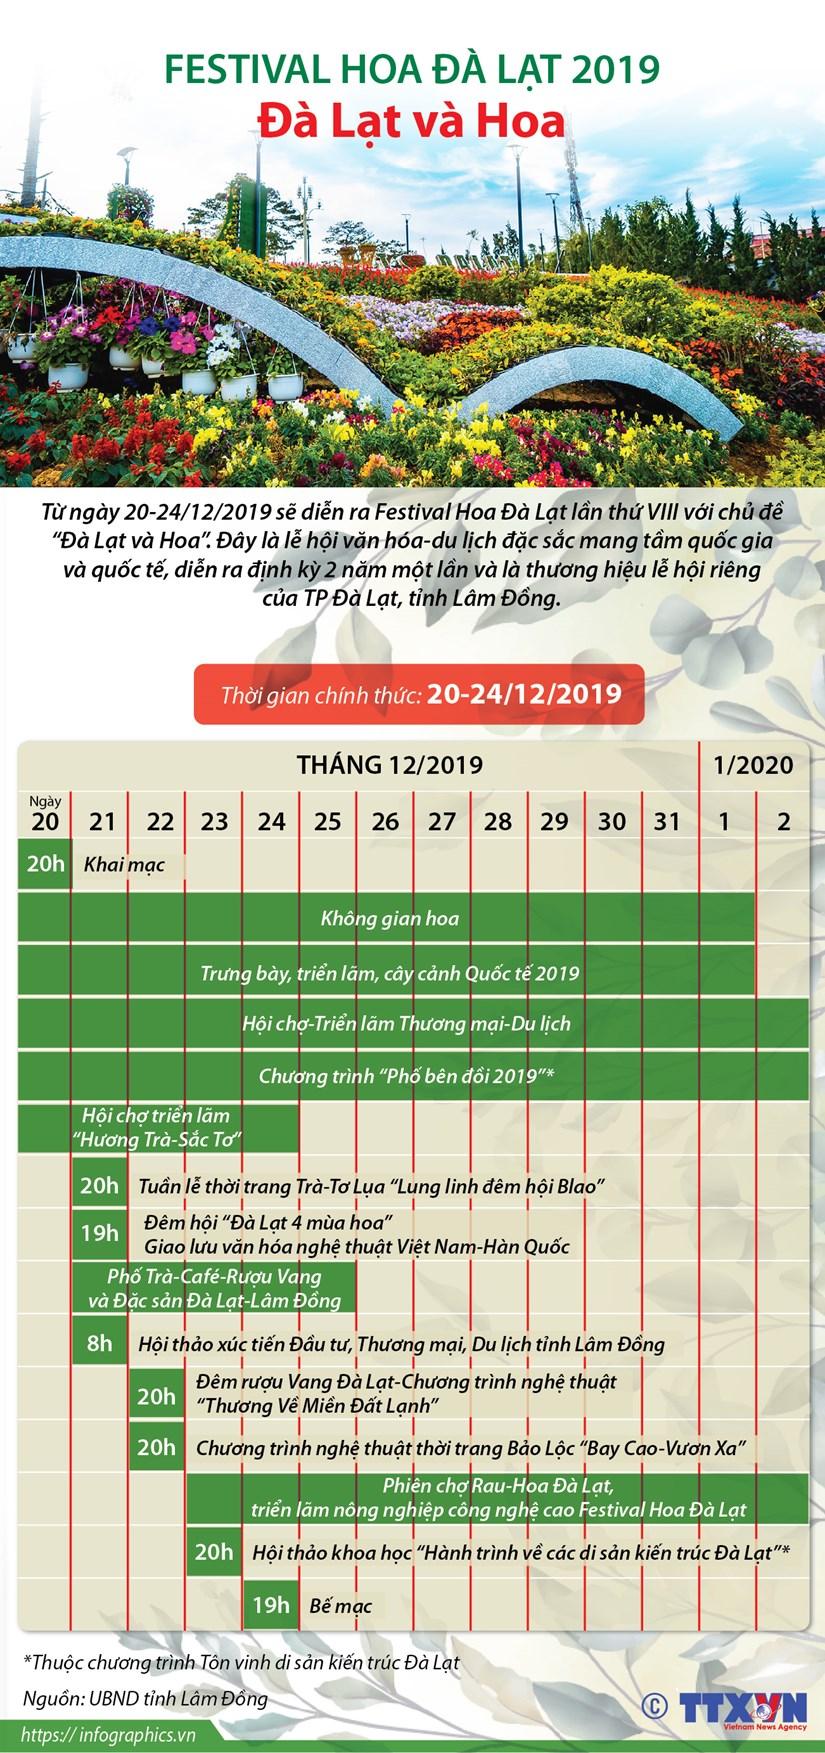 infographics festival hoa da lat 2019 nhieu chuong trinh hap dan